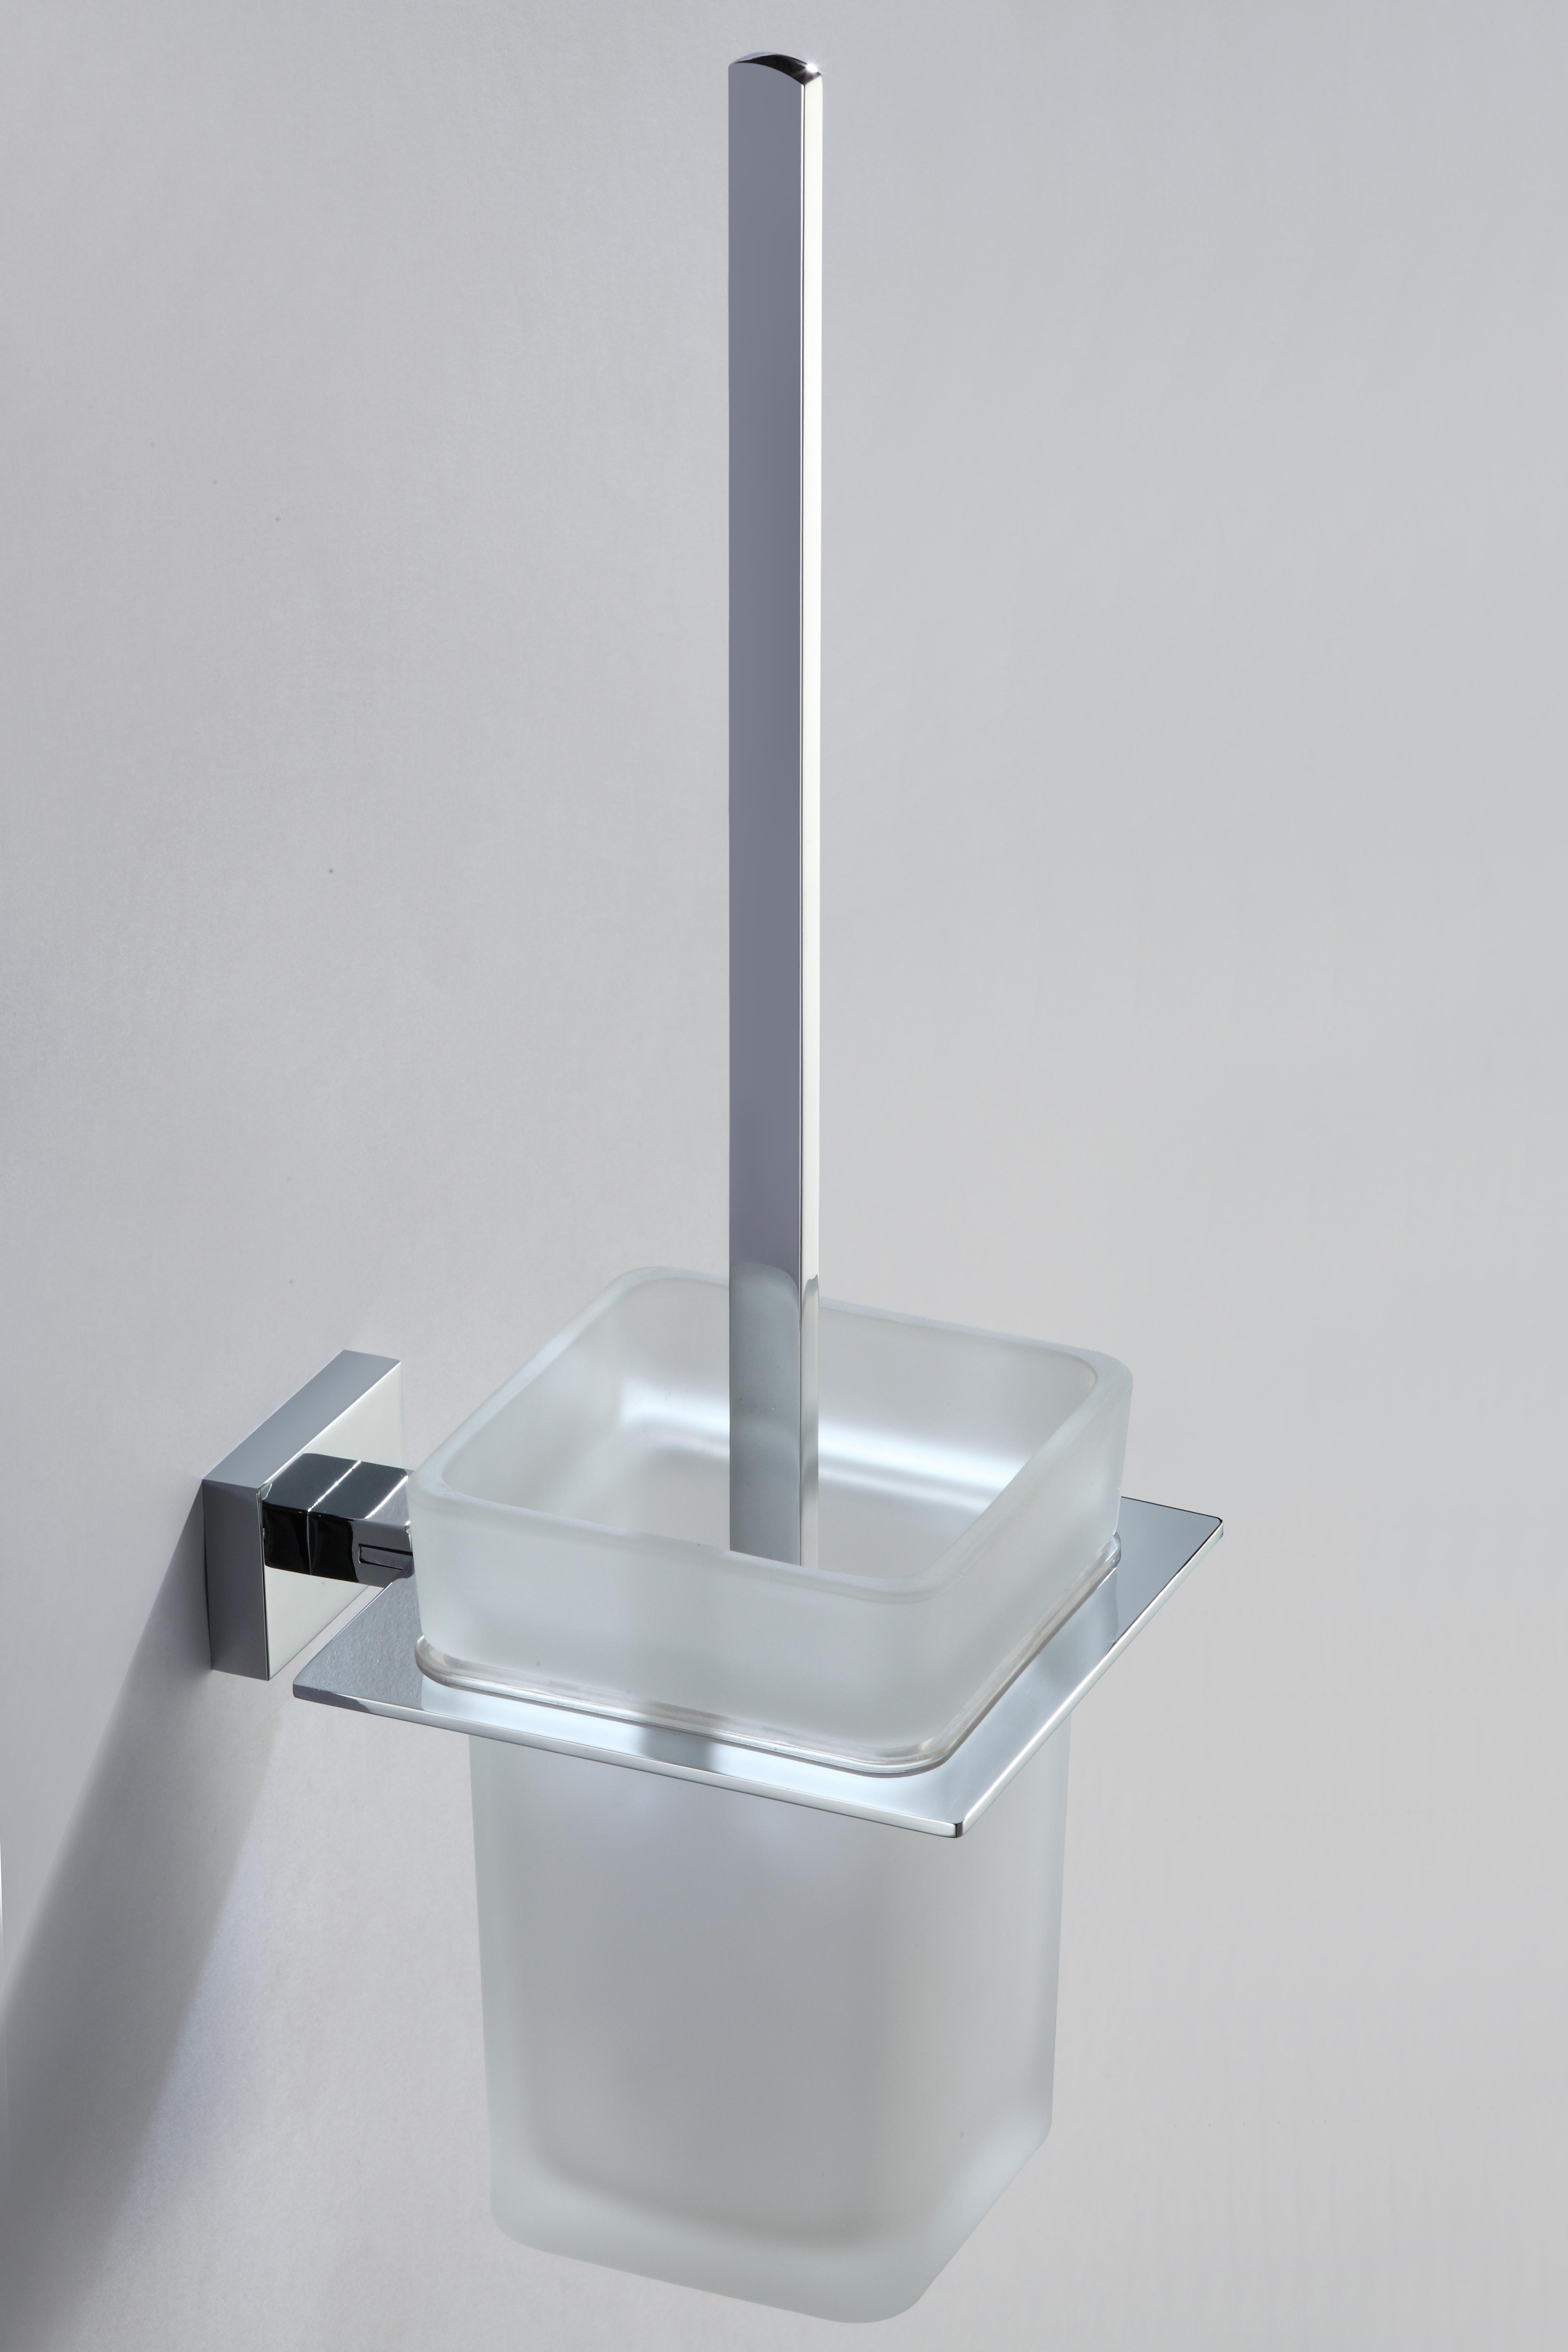 AZ Toilettenbürstengarnitur